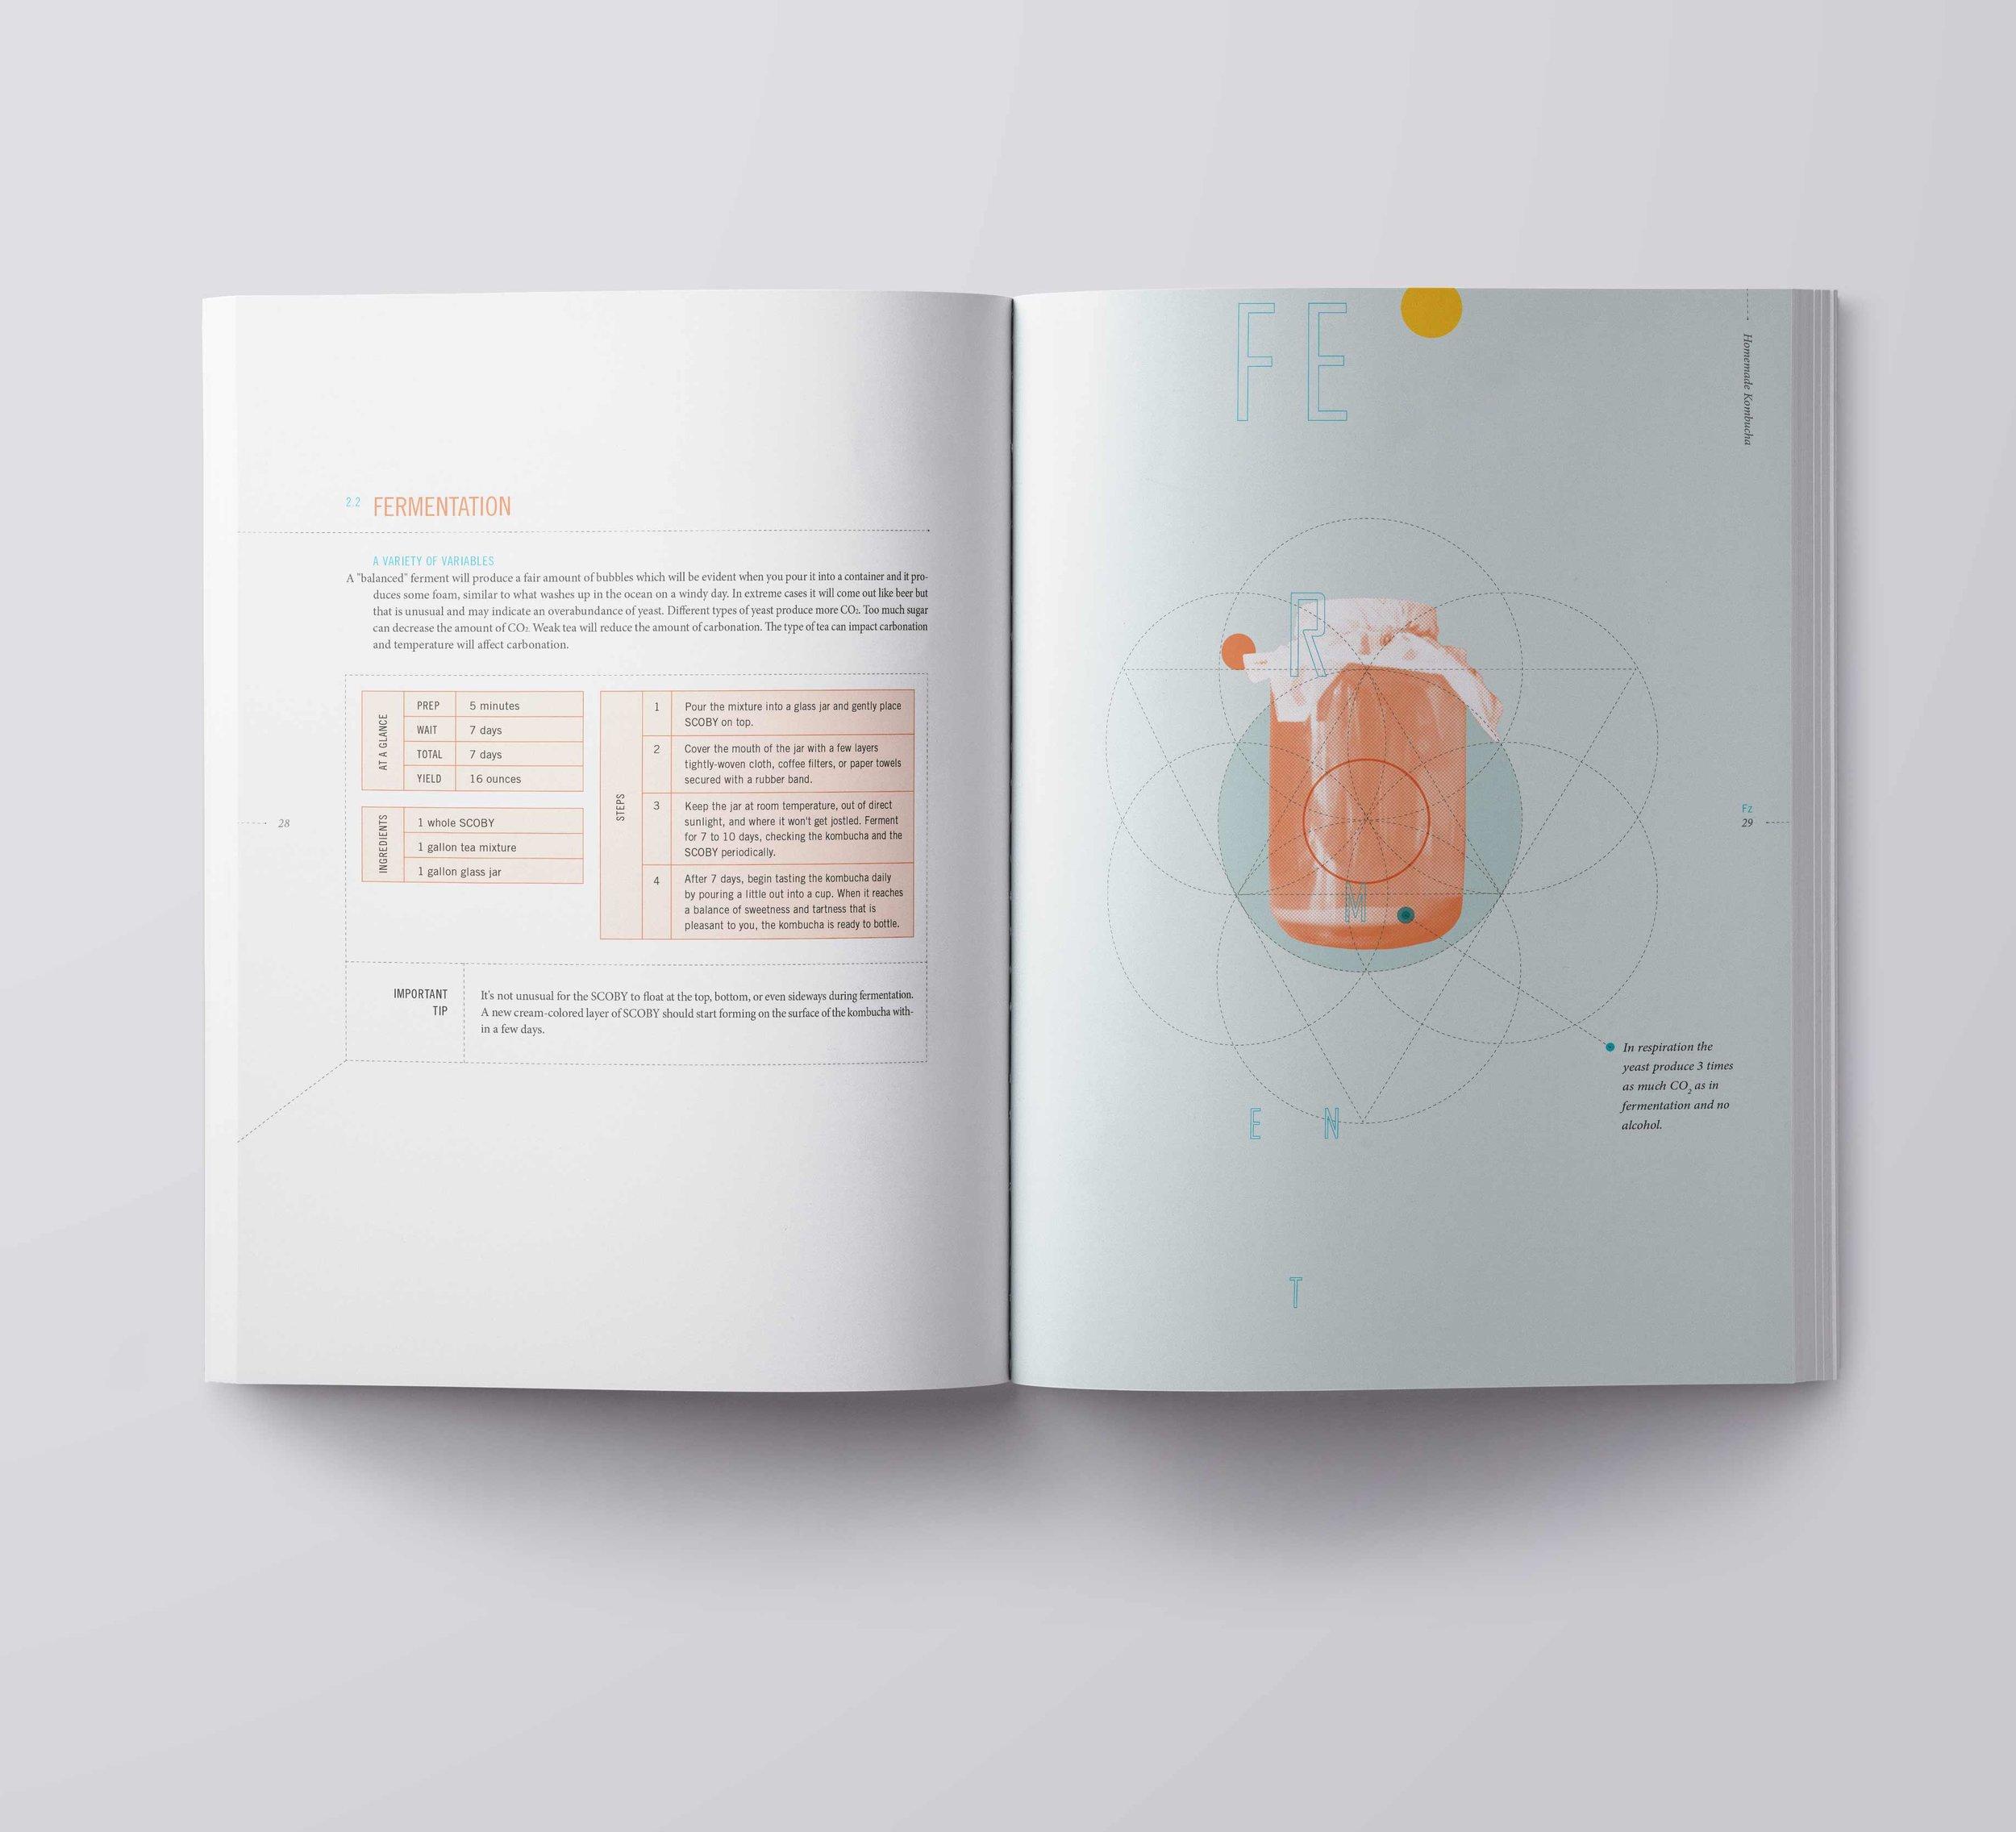 Magazine-USLetter-A4-Mockup-Template_3_LOW.jpg